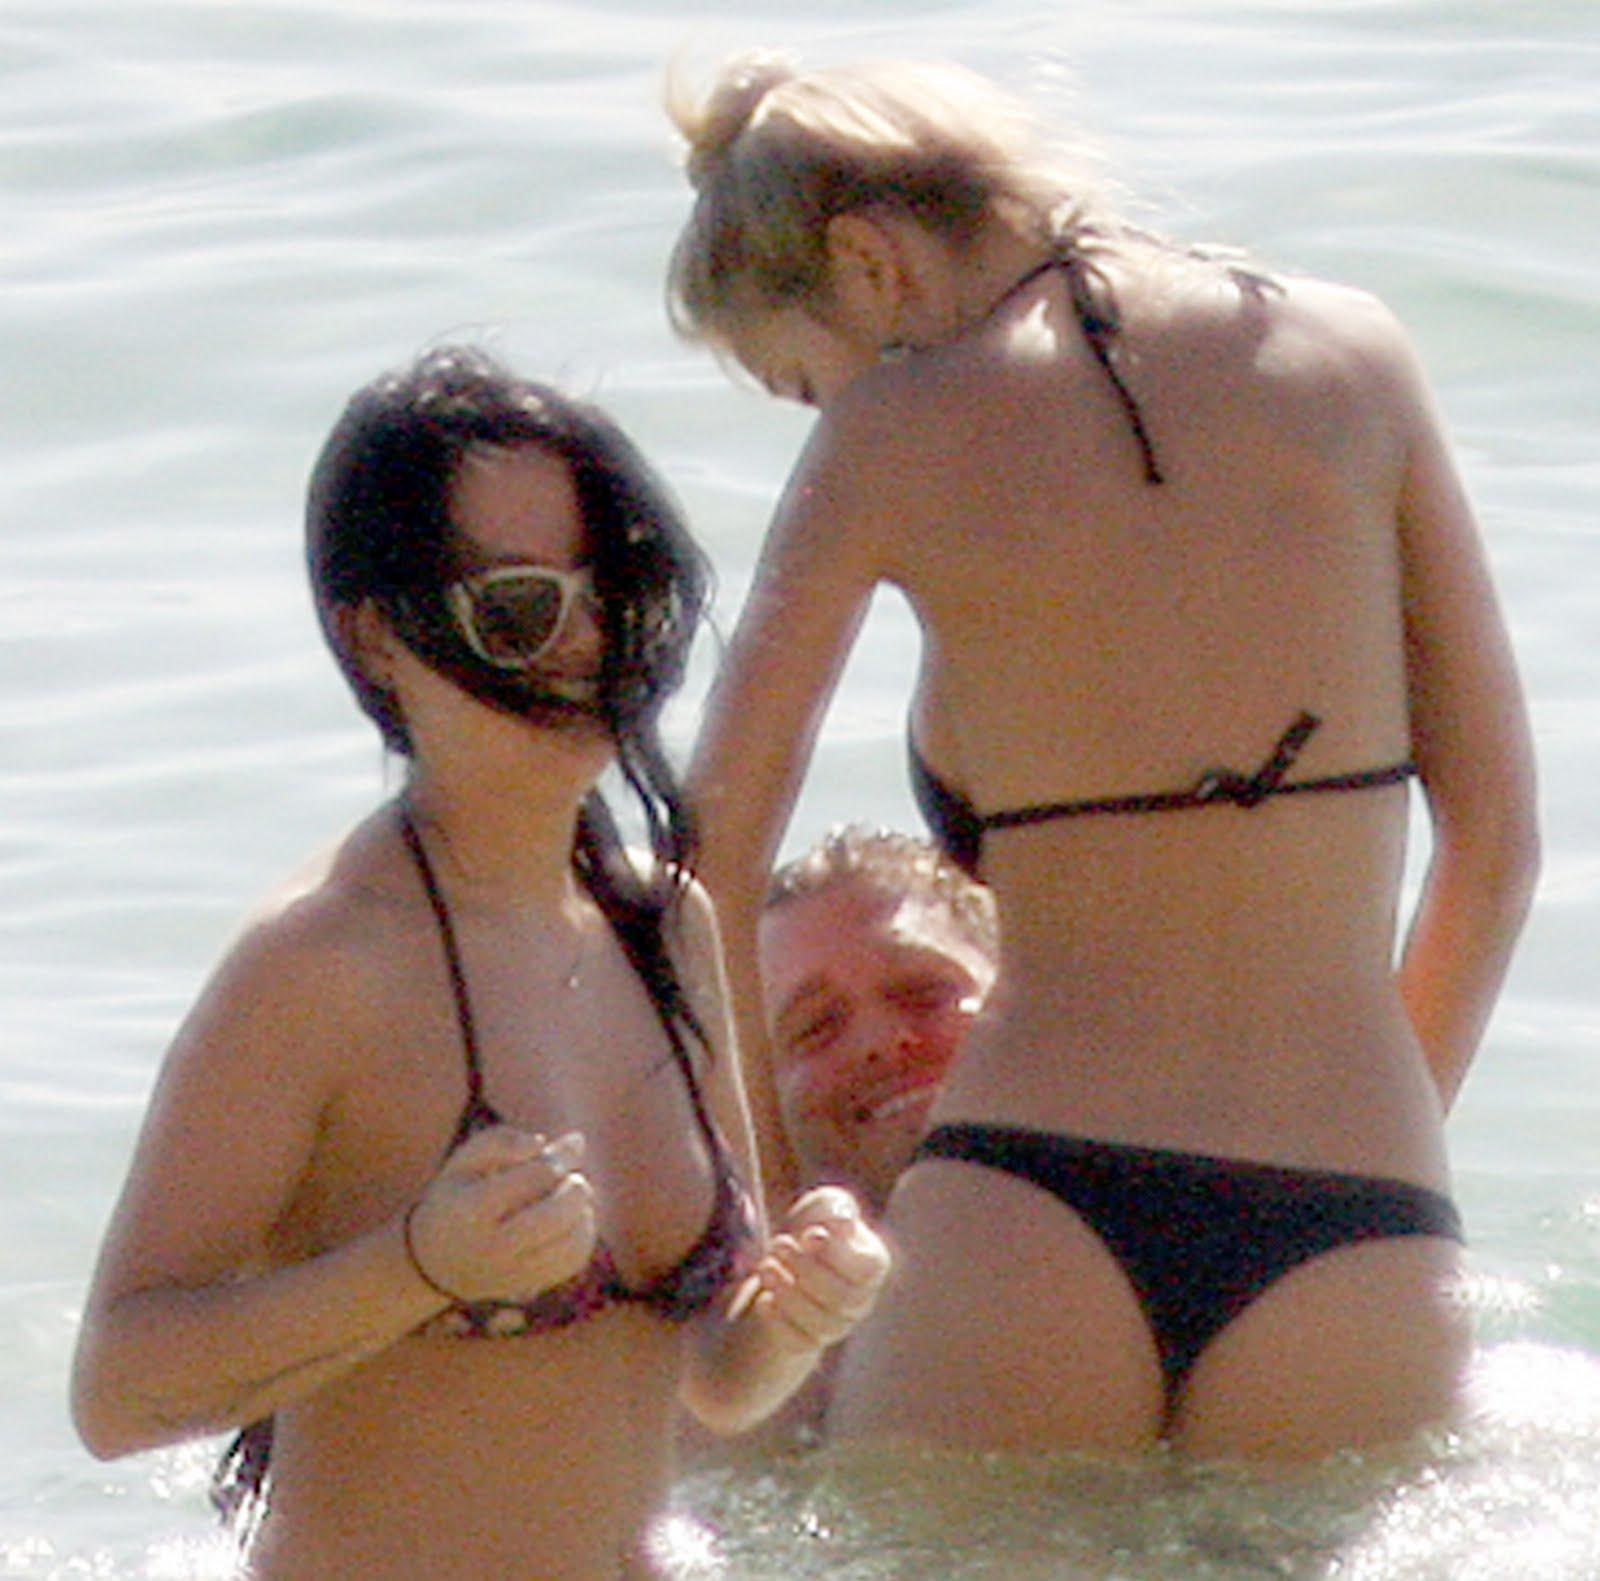 Luisana Lopilato Sexy Bikini Backside At The Beach ~ wow ... Amanda Seyfried Wiki